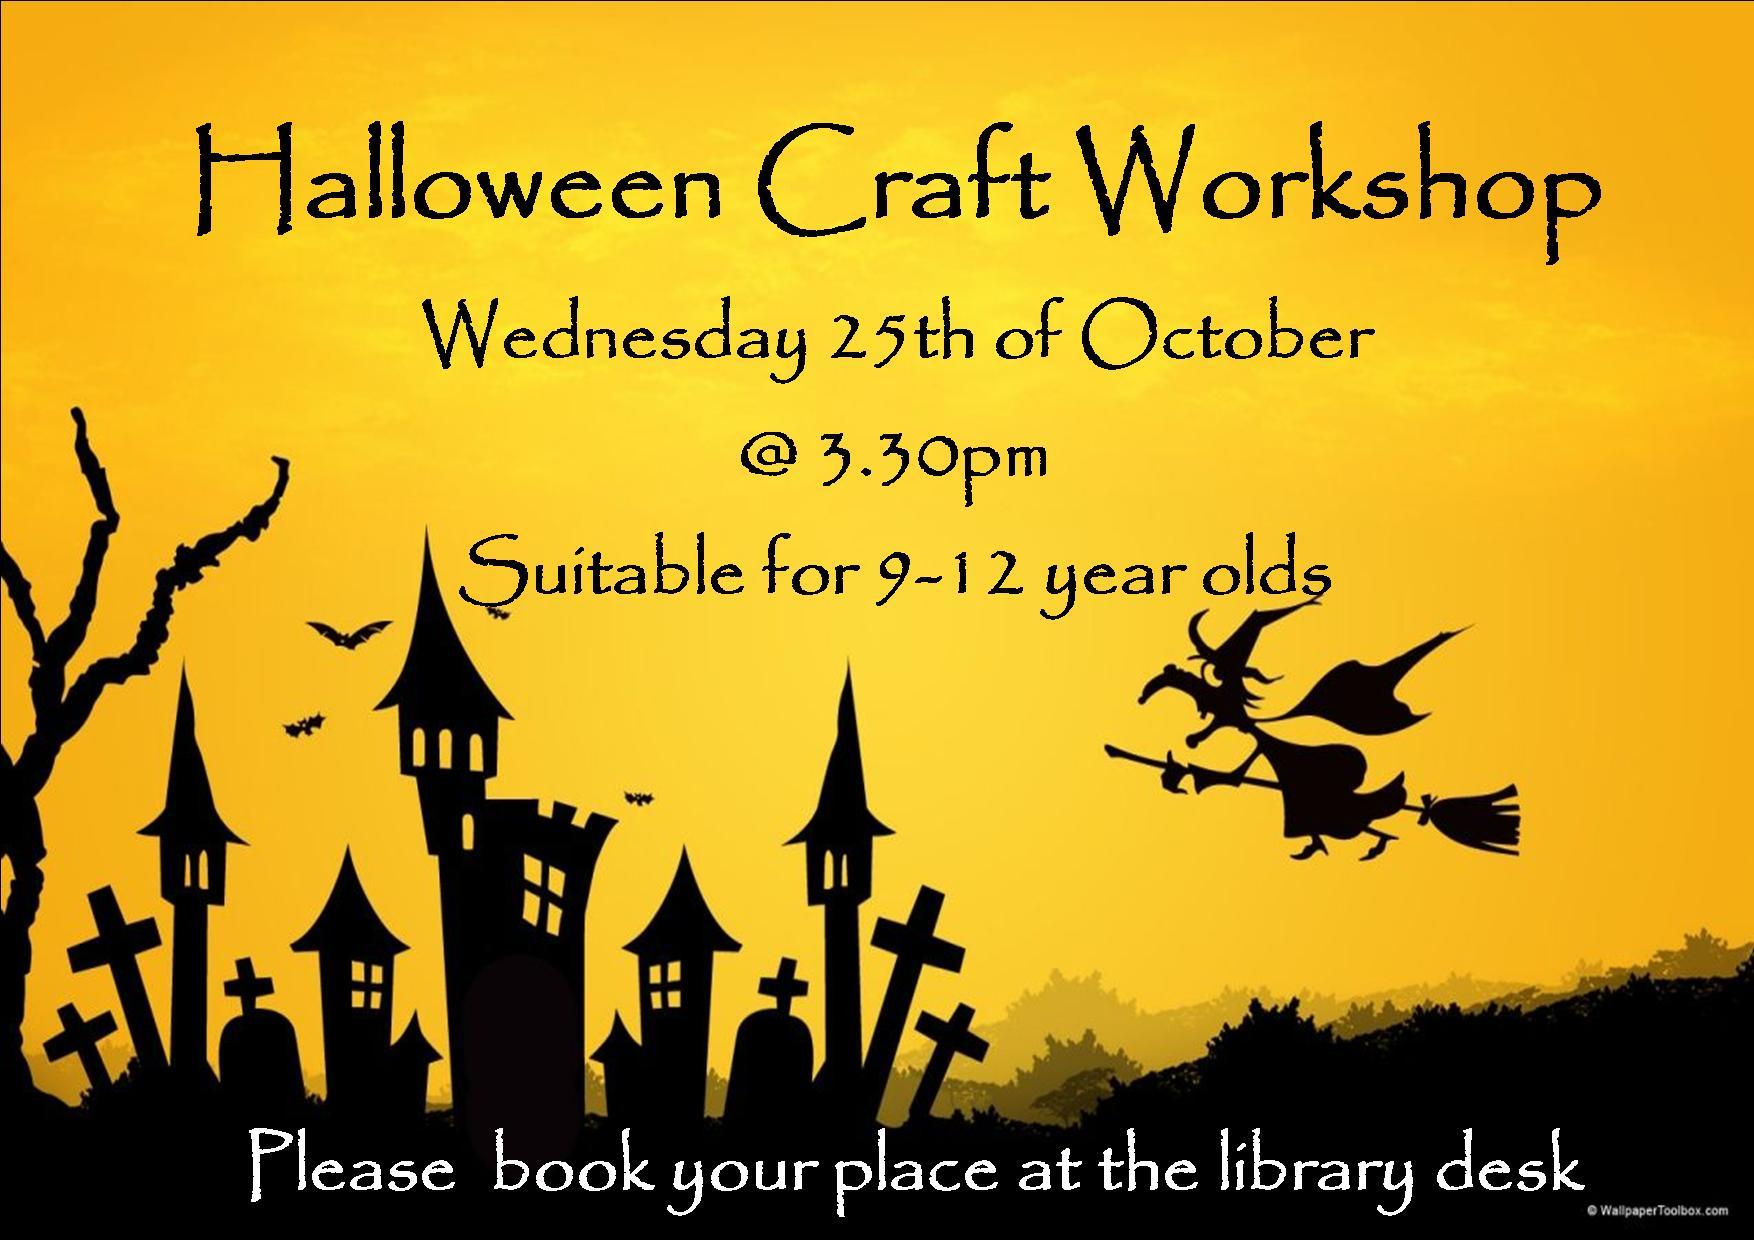 Halloween Craft Workshop In Cashel Library